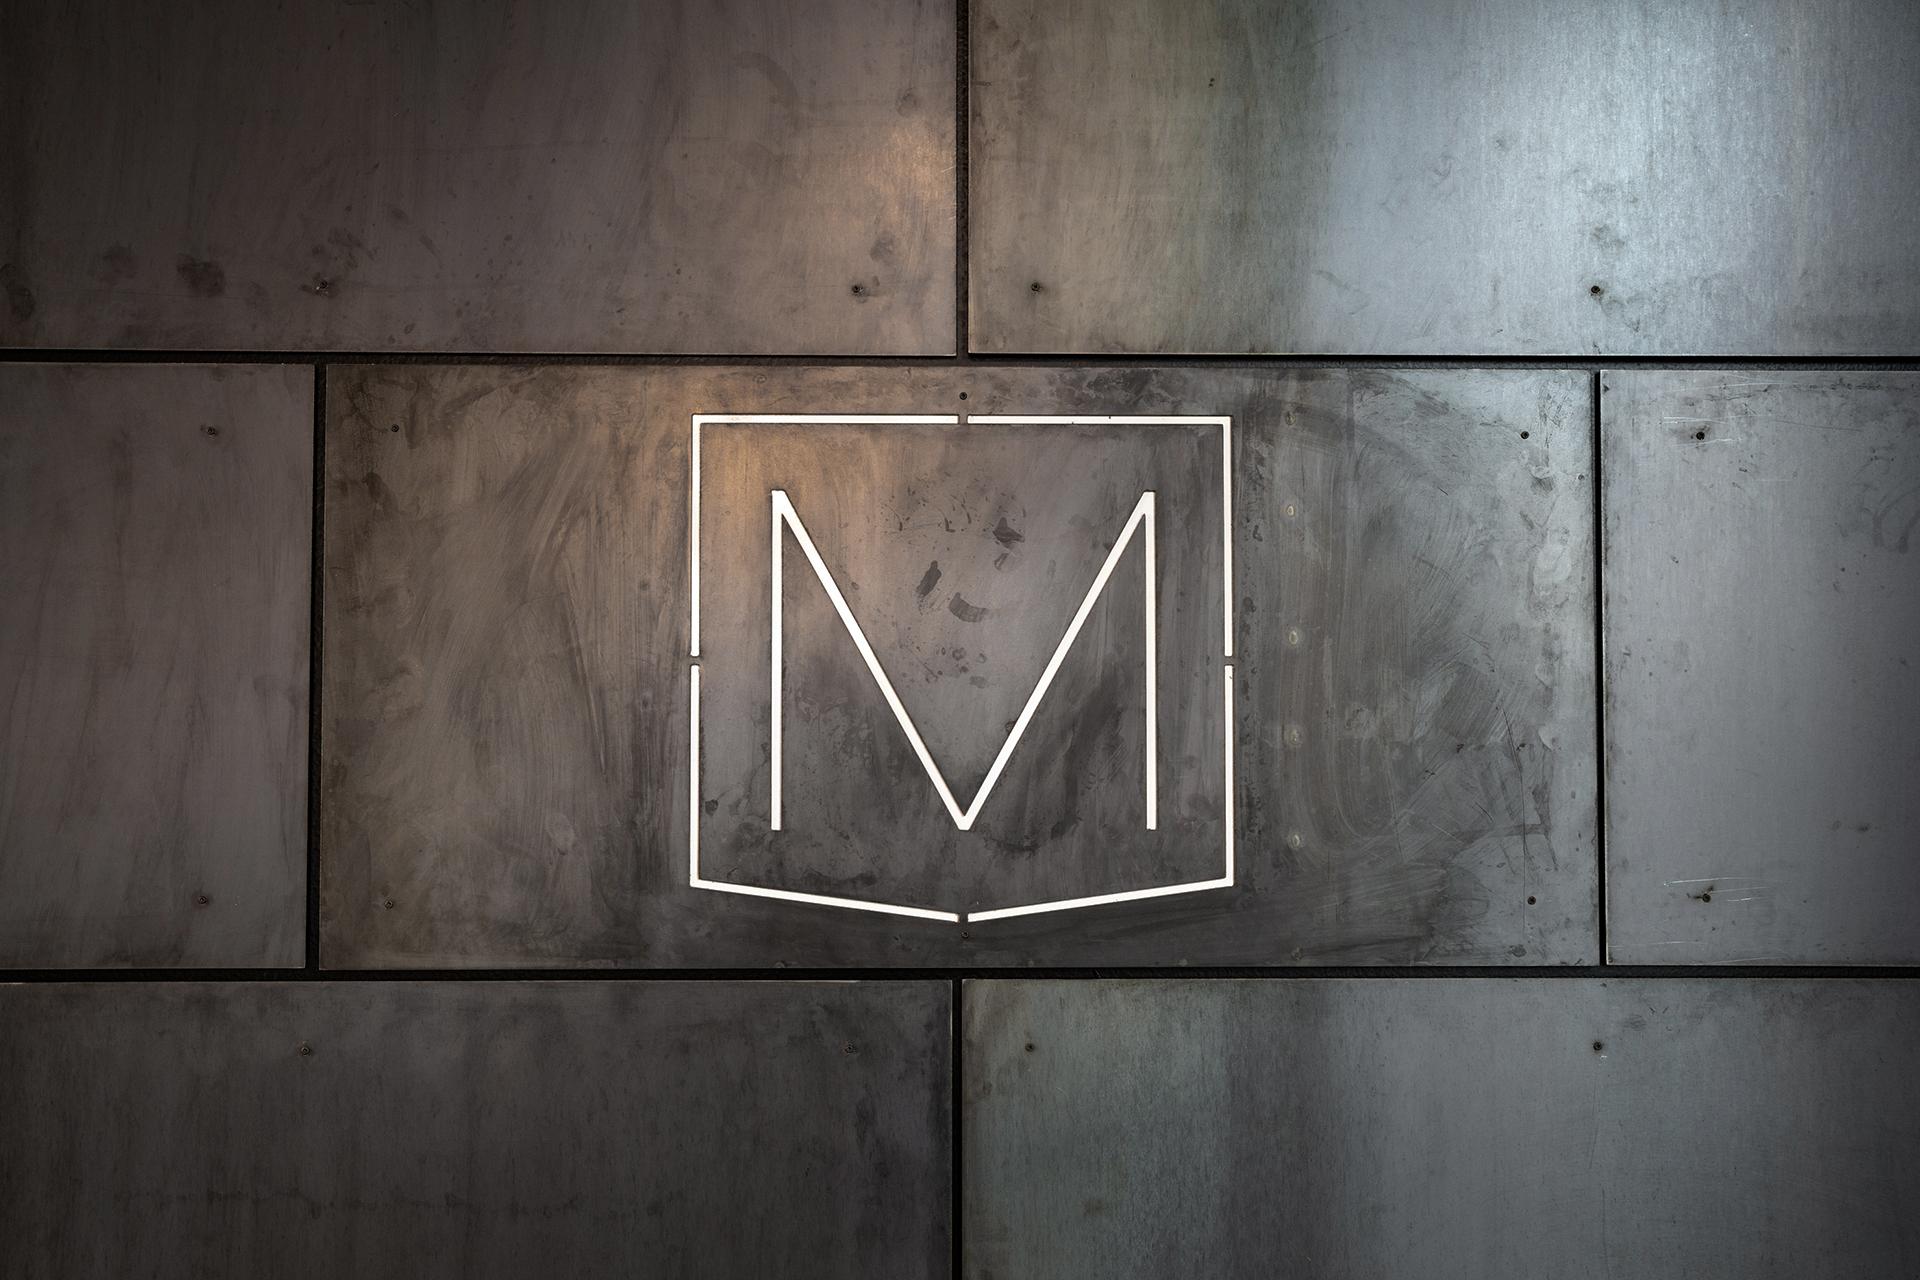 mesa-tacos-tequila-booth-backdrop-logo